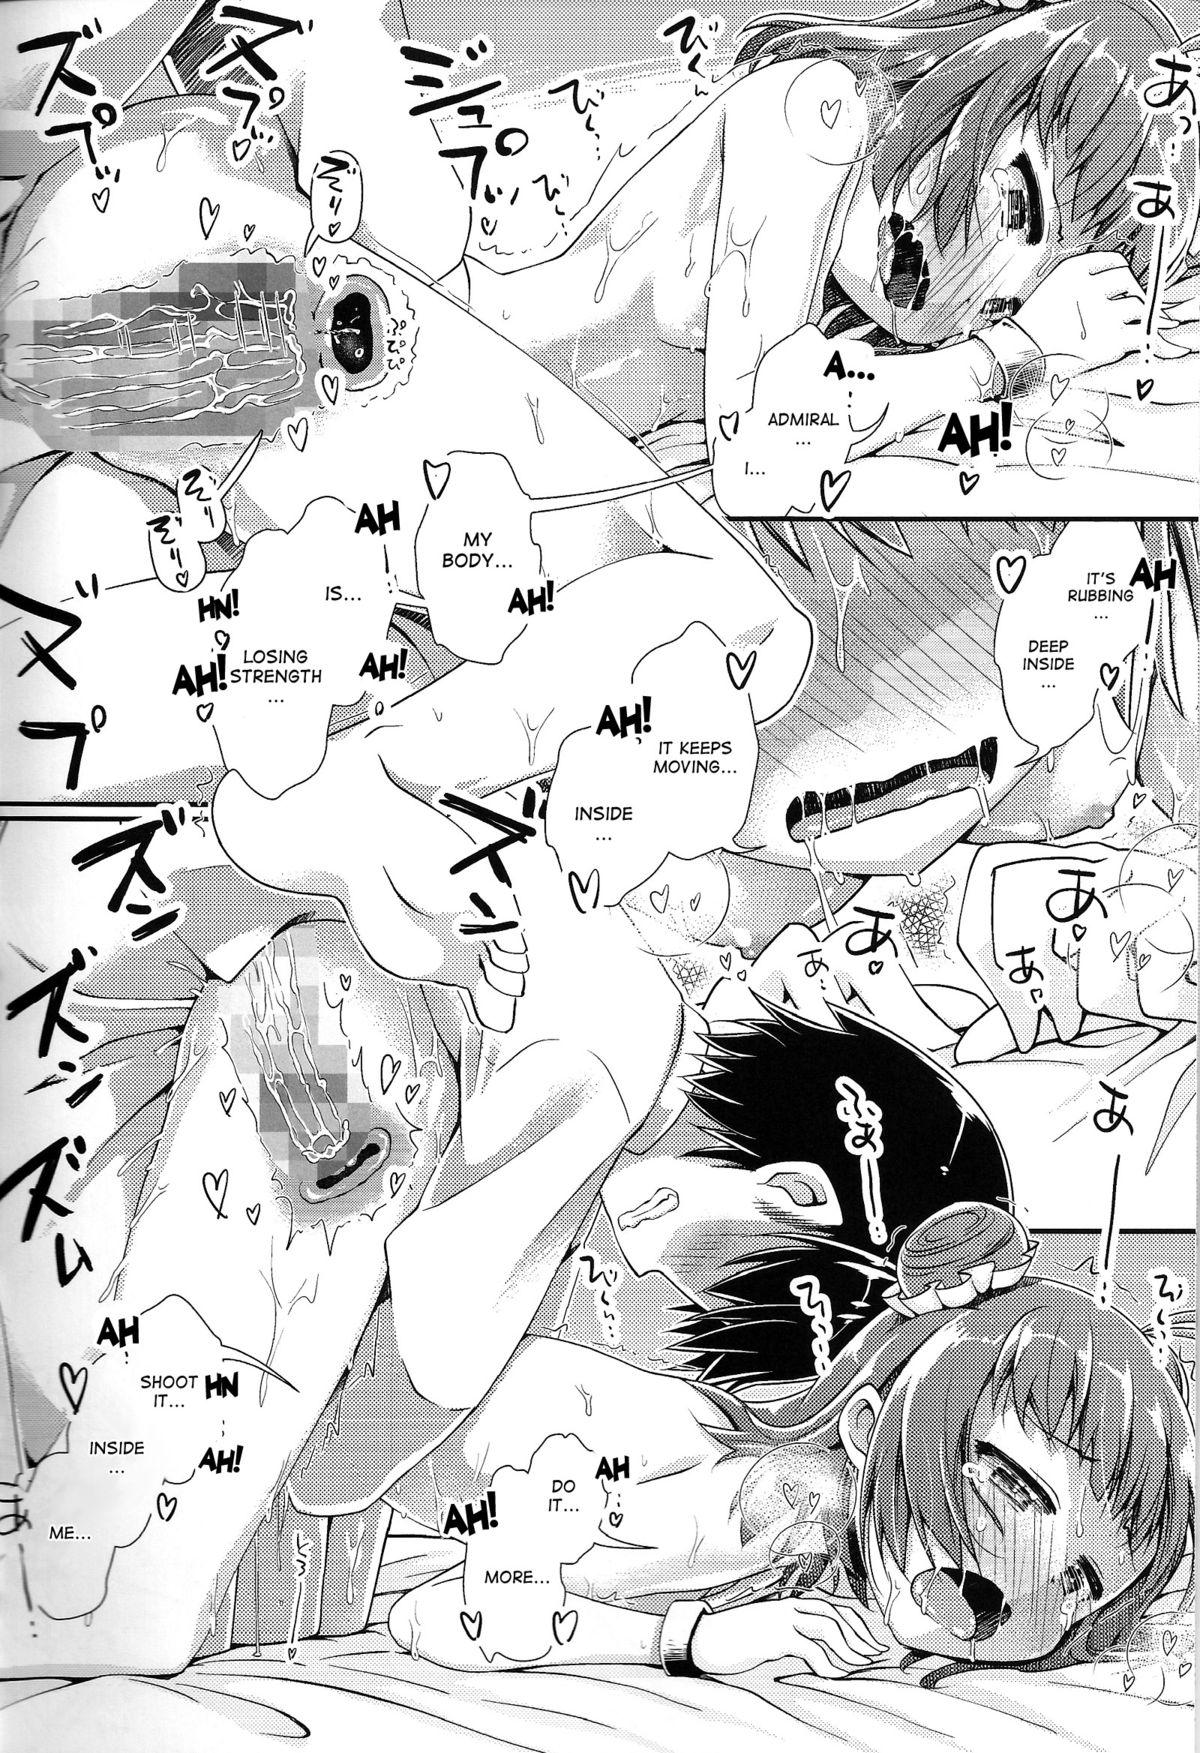 2230 Shitsumu Shitsu Kyoushuu Sakusen - 22:30 Admiral Office Assault Operation 18